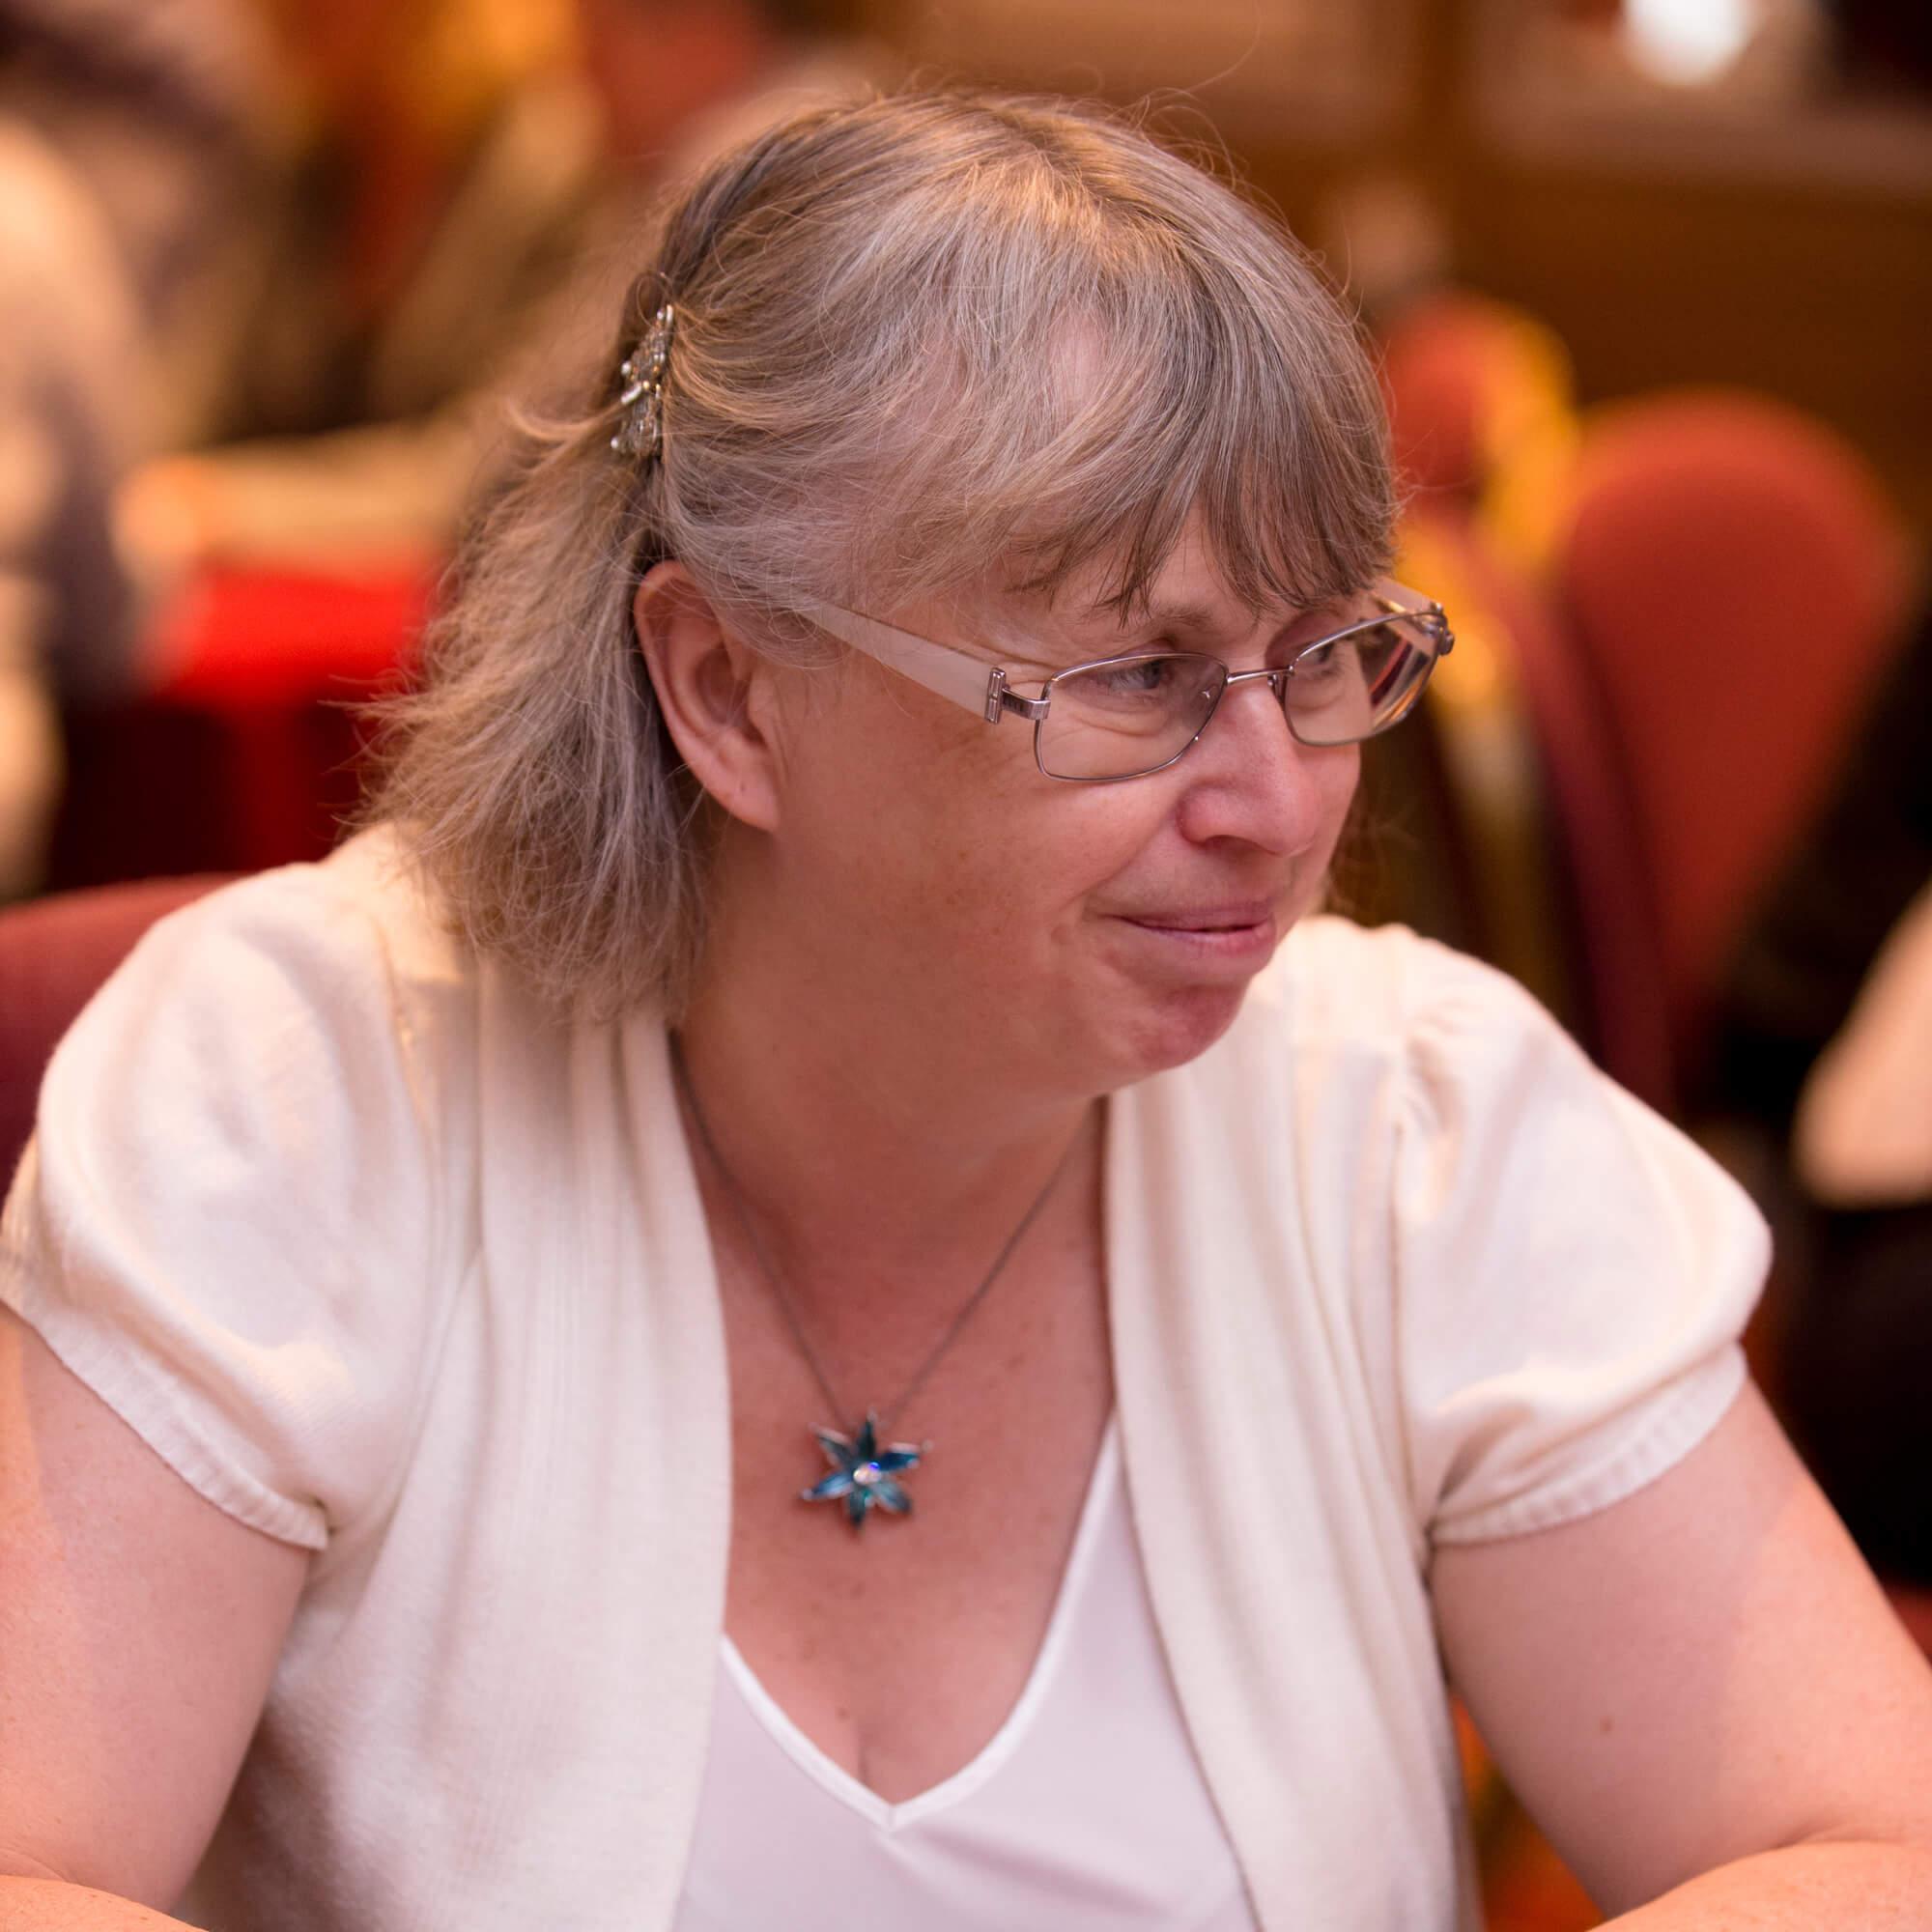 Senior lecturer Juliet Hogsden attending a conference